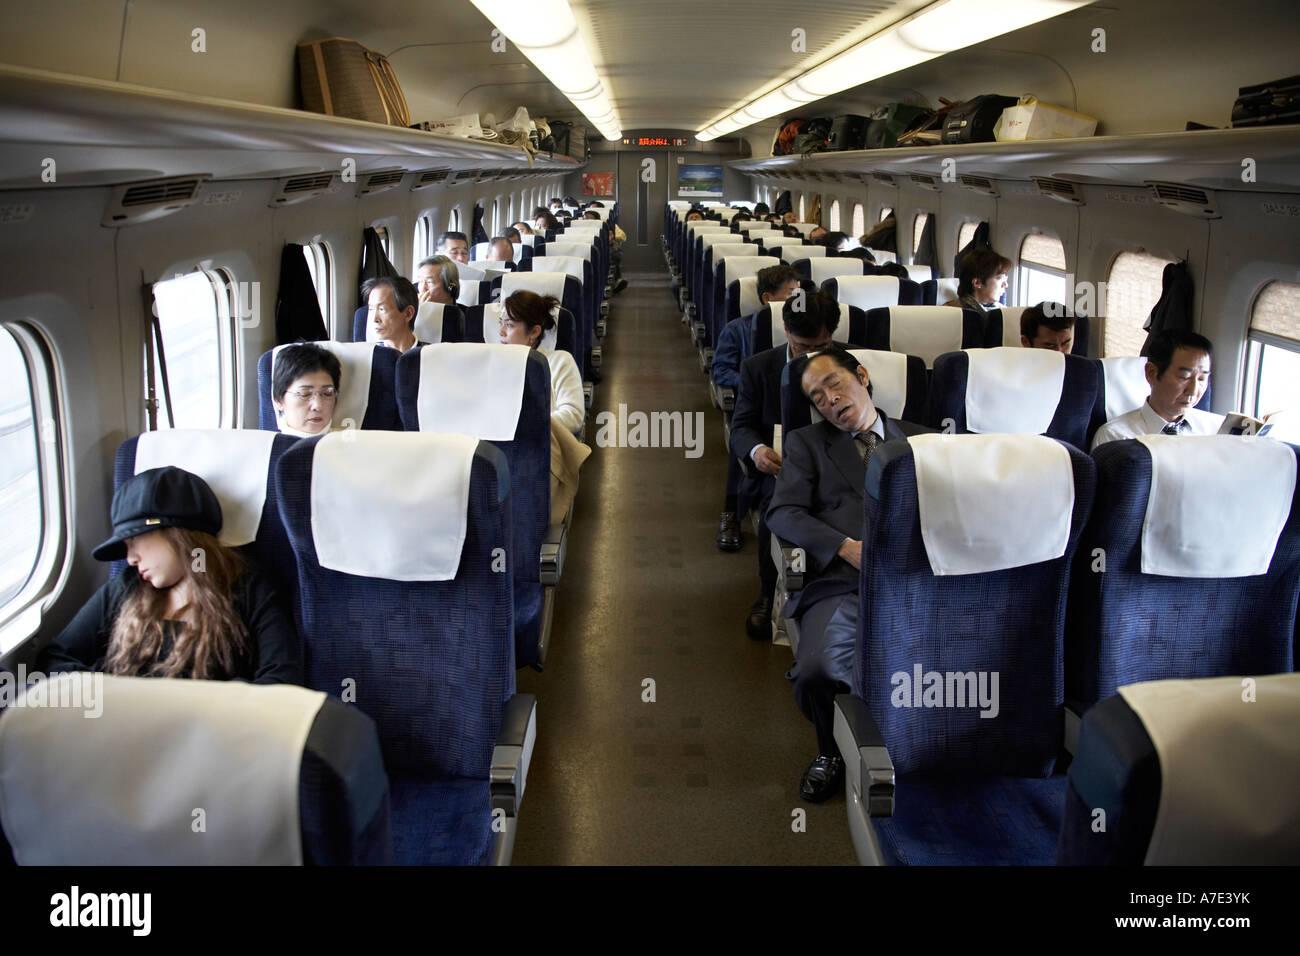 Japan Railways Shinkansen Super express Nozomi Bullet train interior Stock Photo 11811510  Alamy